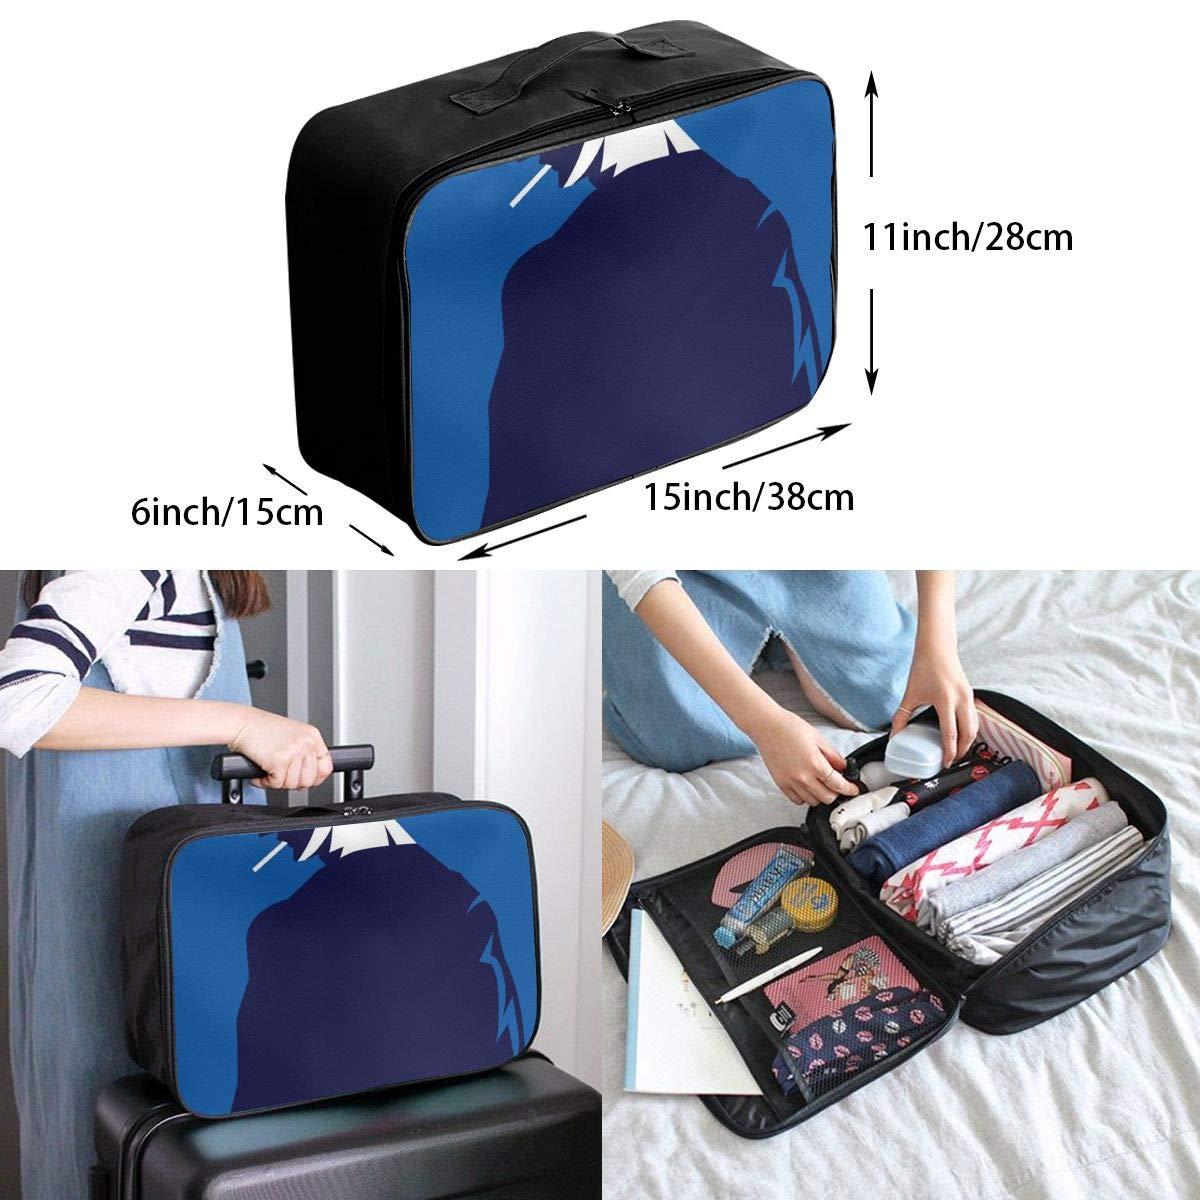 Smoking Boy Cartoon Silhouette Navy Blue Travel Lightweight Waterproof Folding Storage Portable Luggage Duffle Tote Bag Large Capacity In Trolley Handle Bags 6x11x15 Inch